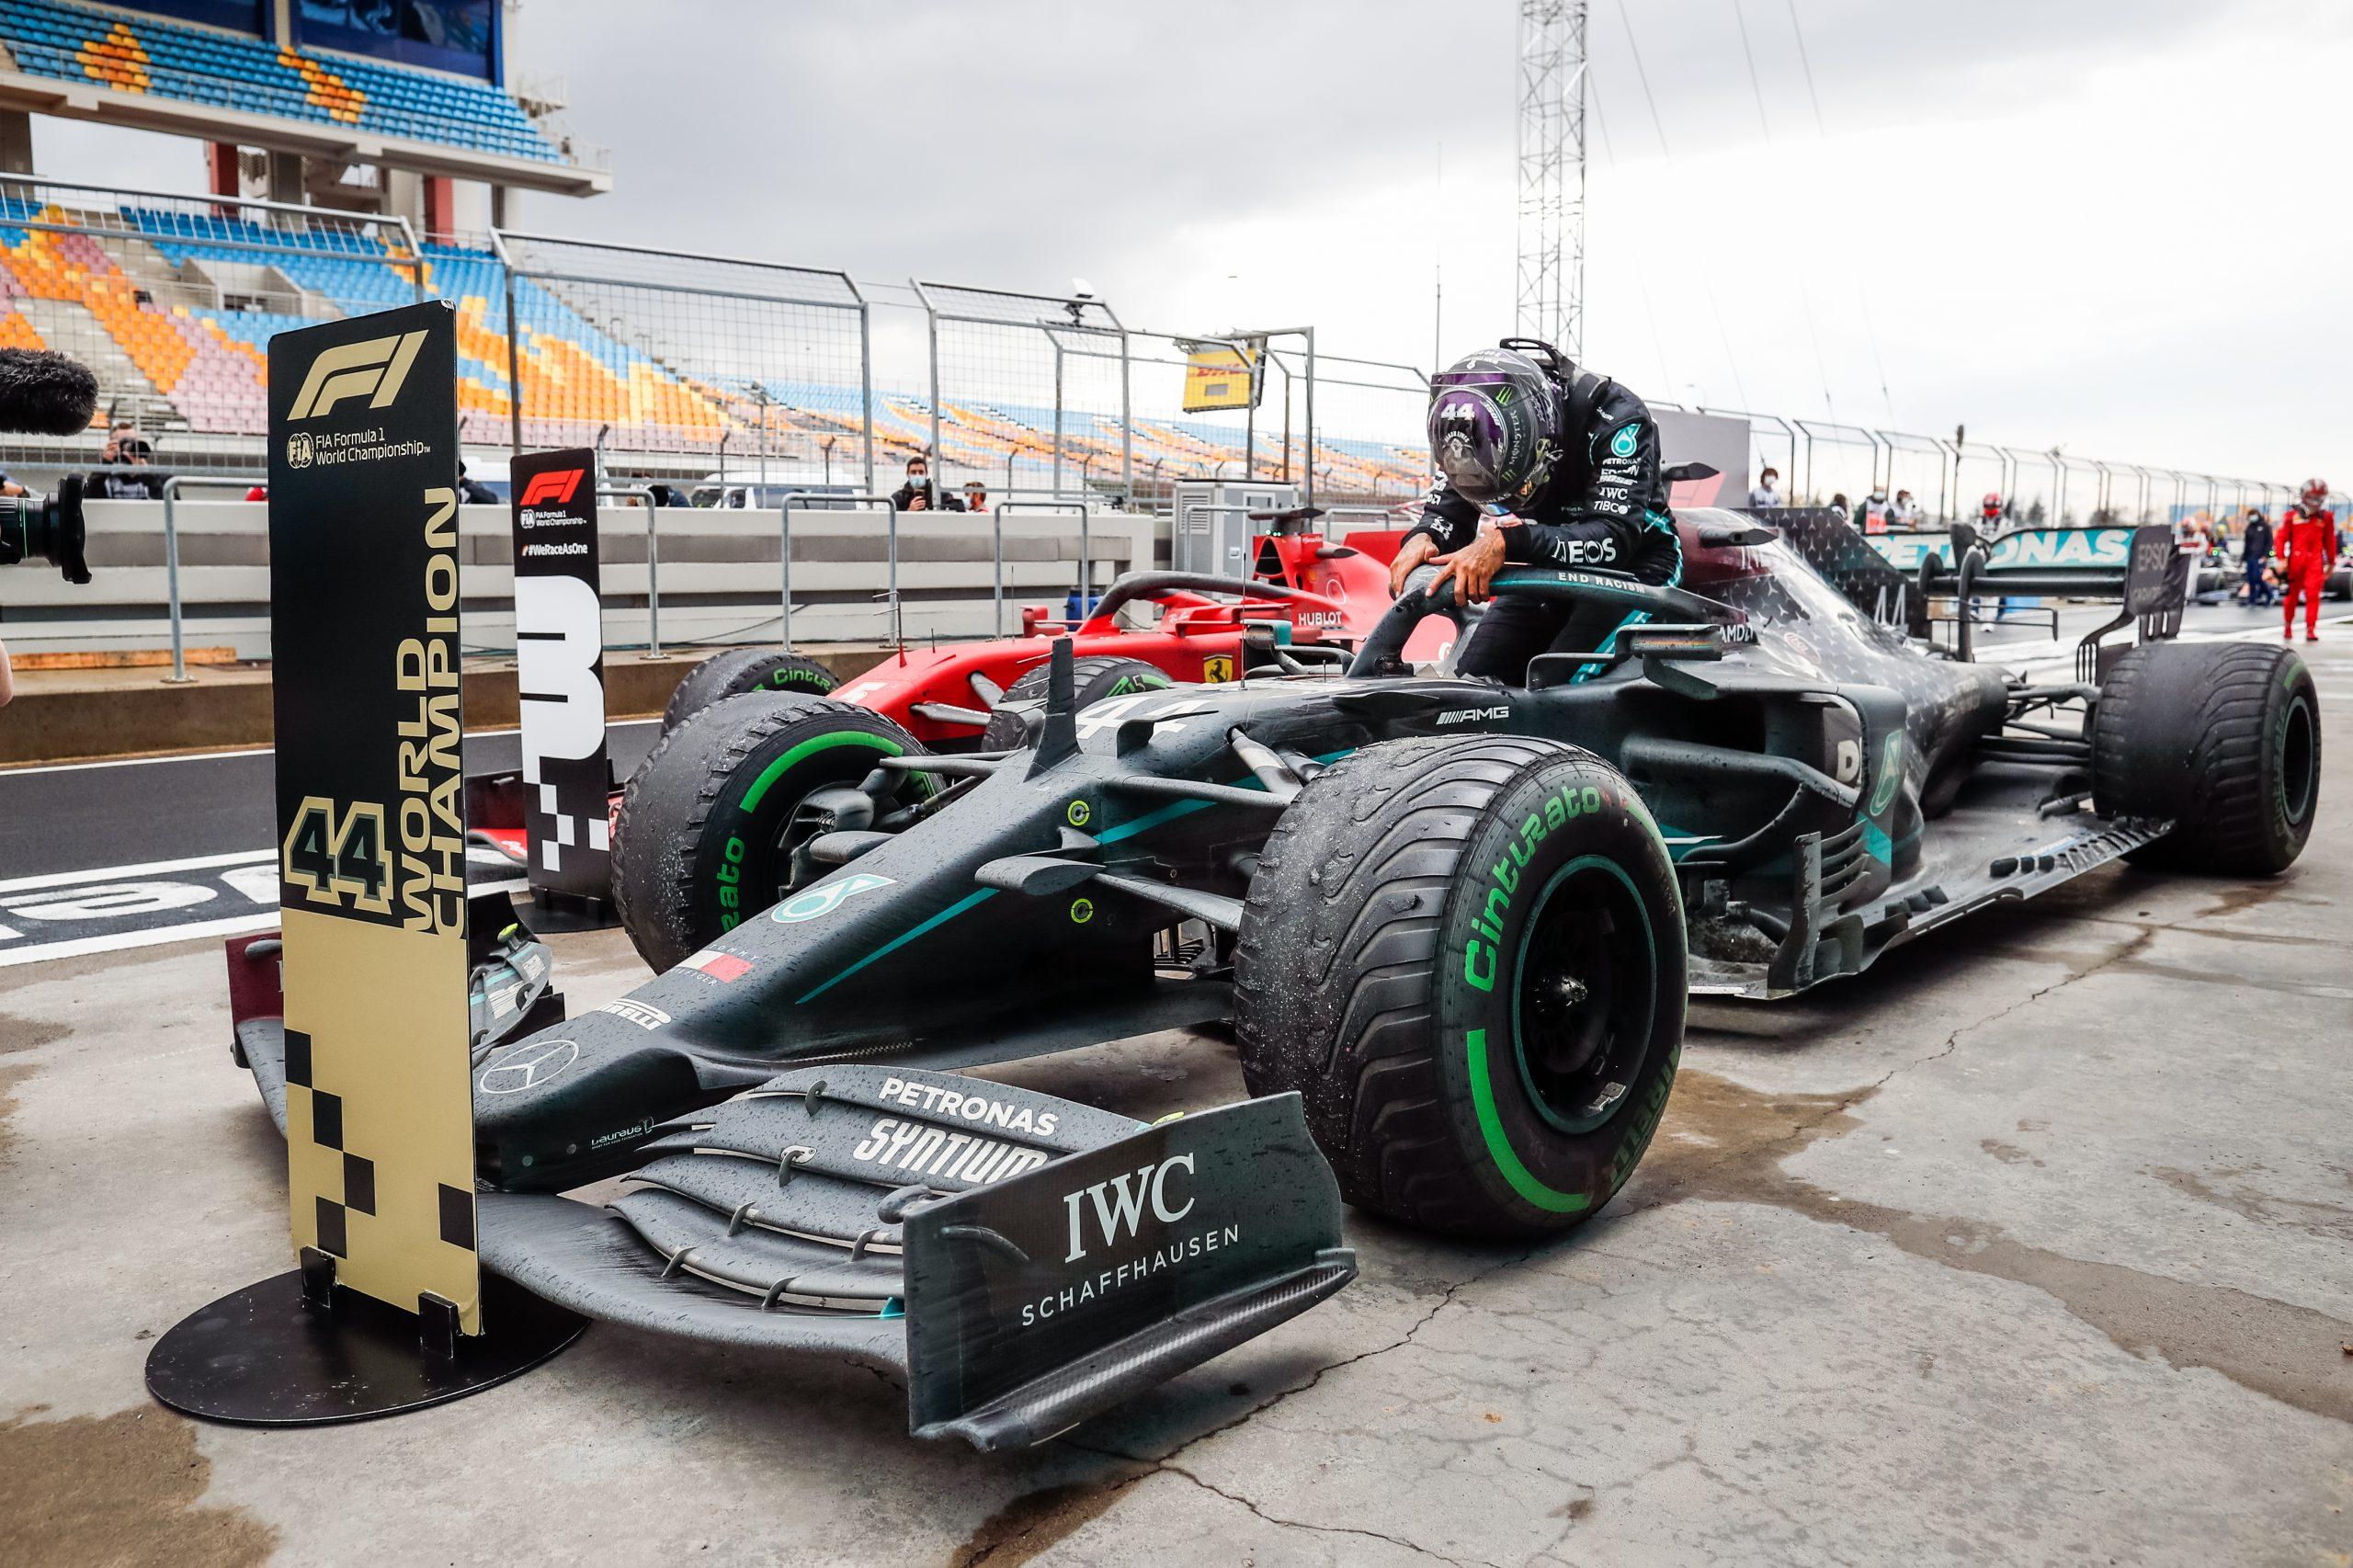 F1 – TURKISH GRAND PRIX 2020 – RACE